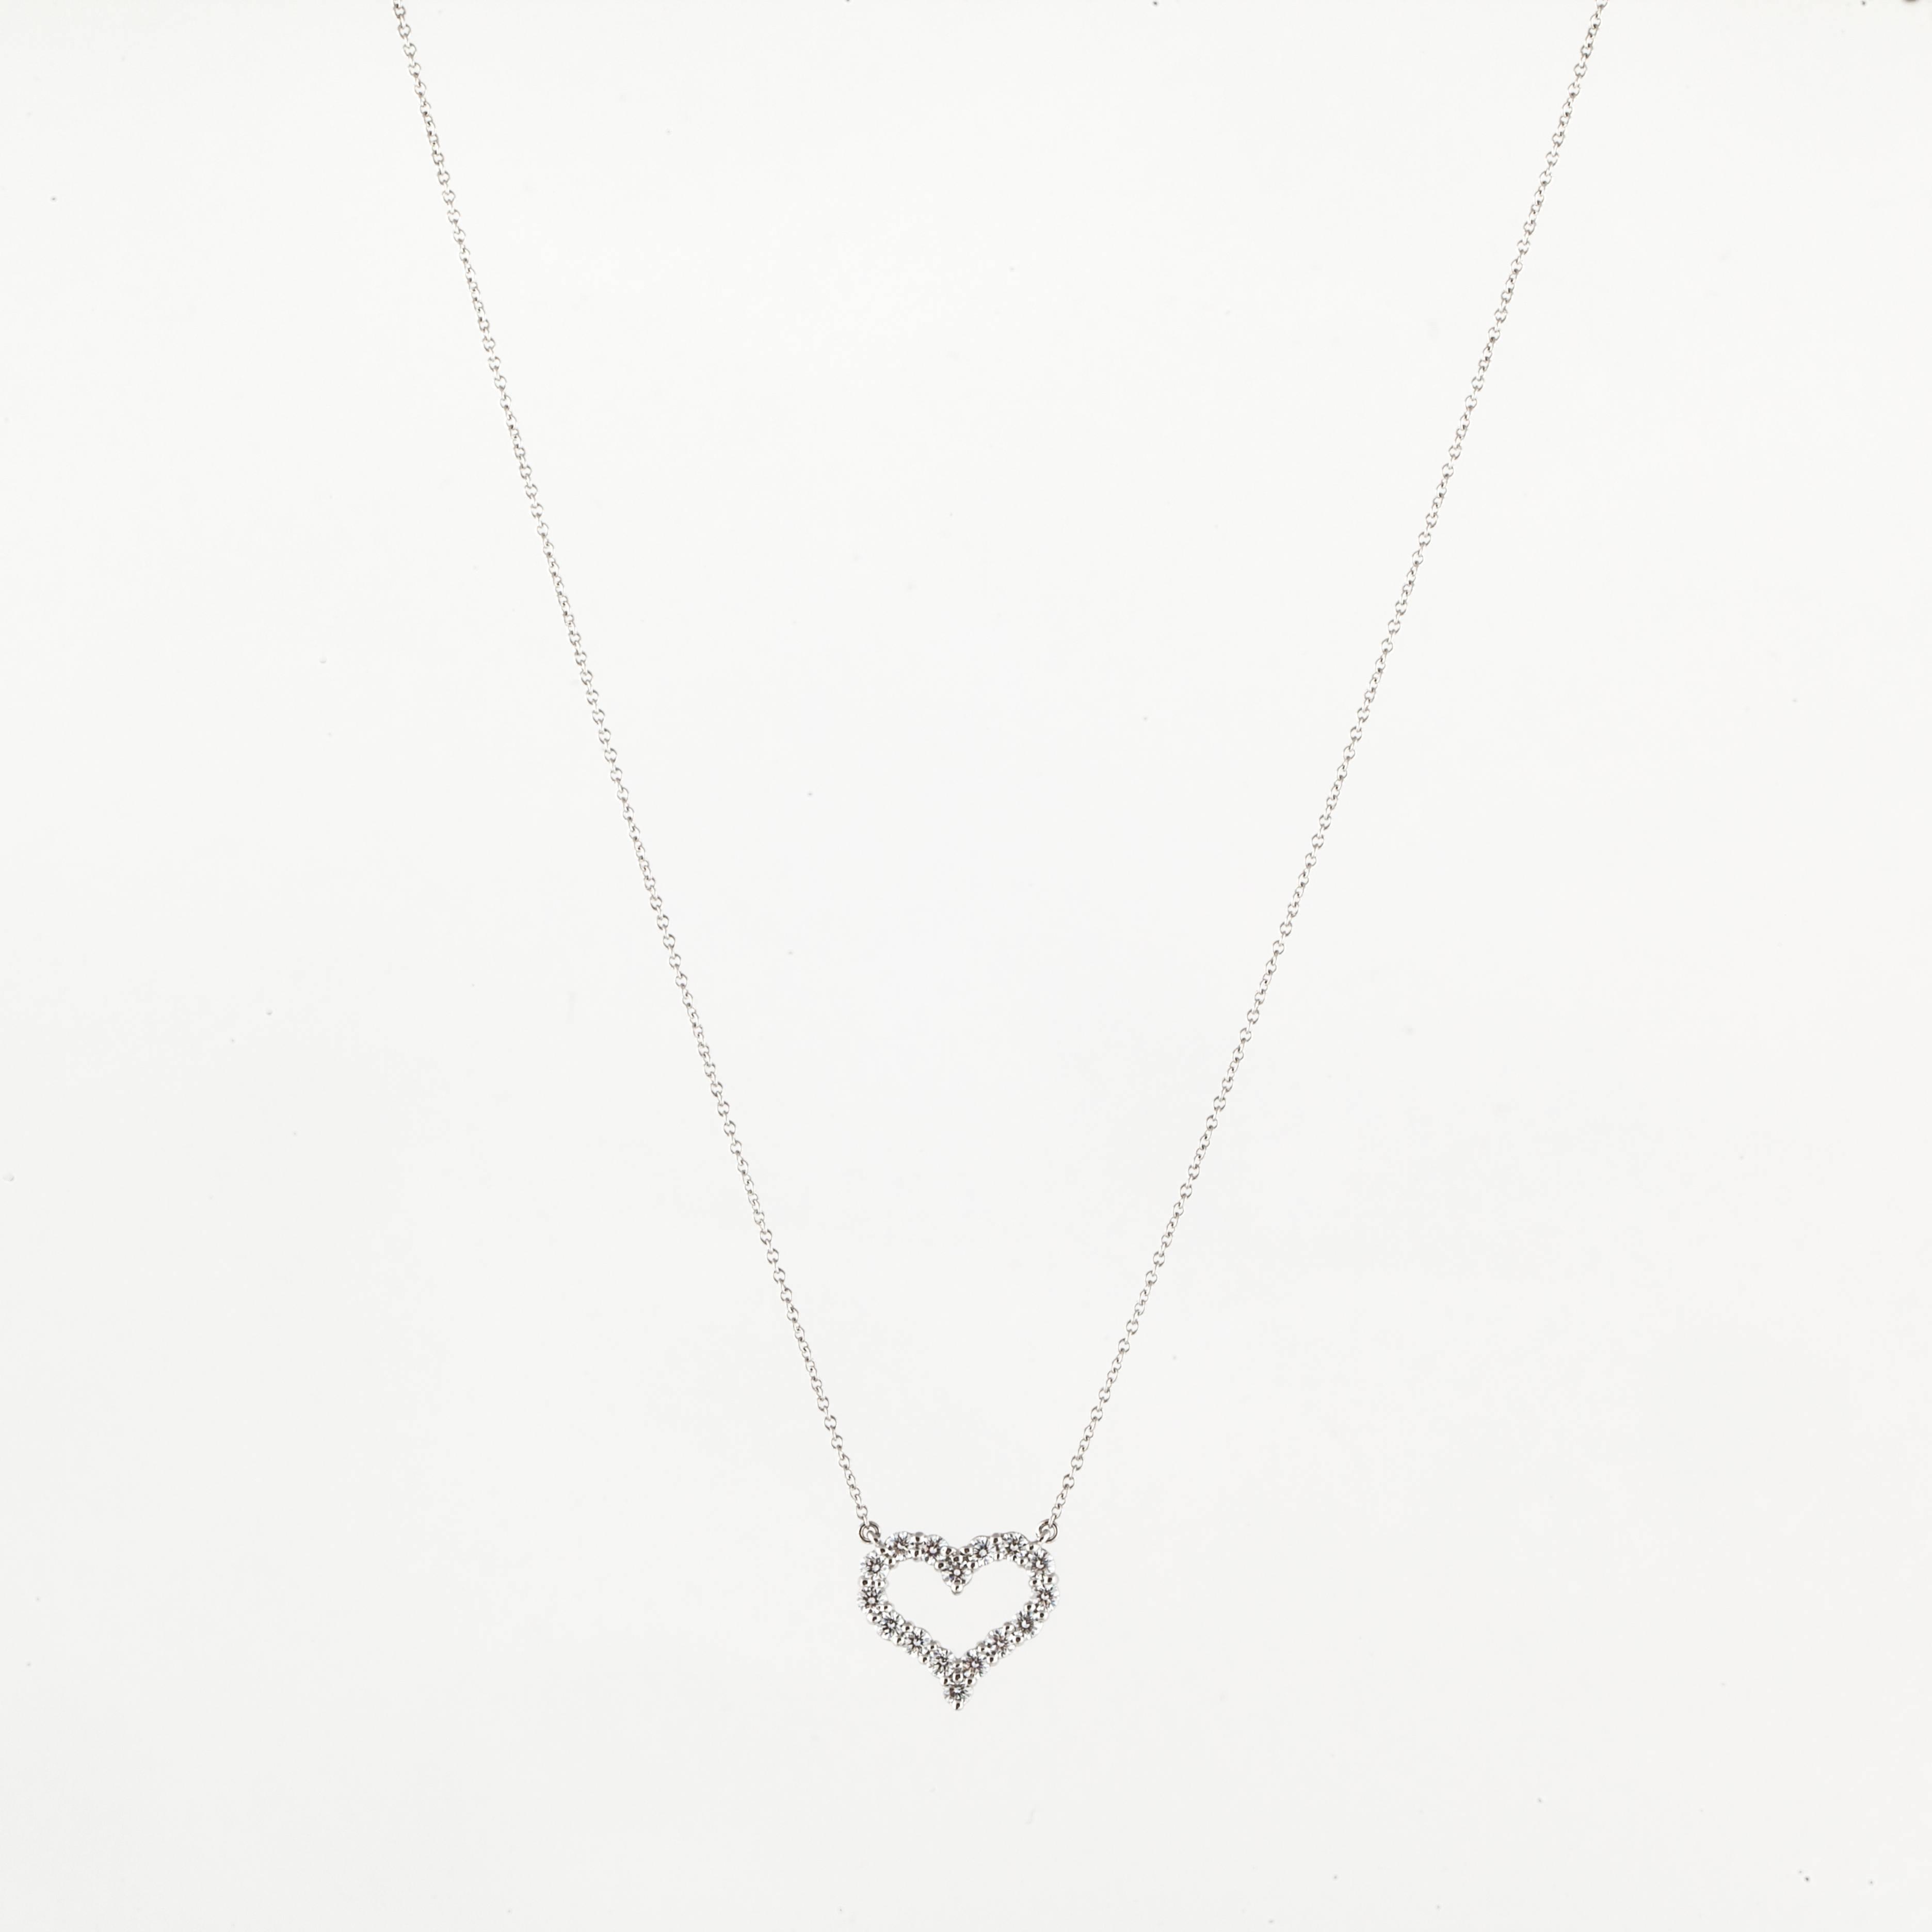 e1f93ea7f6e21 Tiffany and Co. Diamond Heart Necklace at 1stdibs